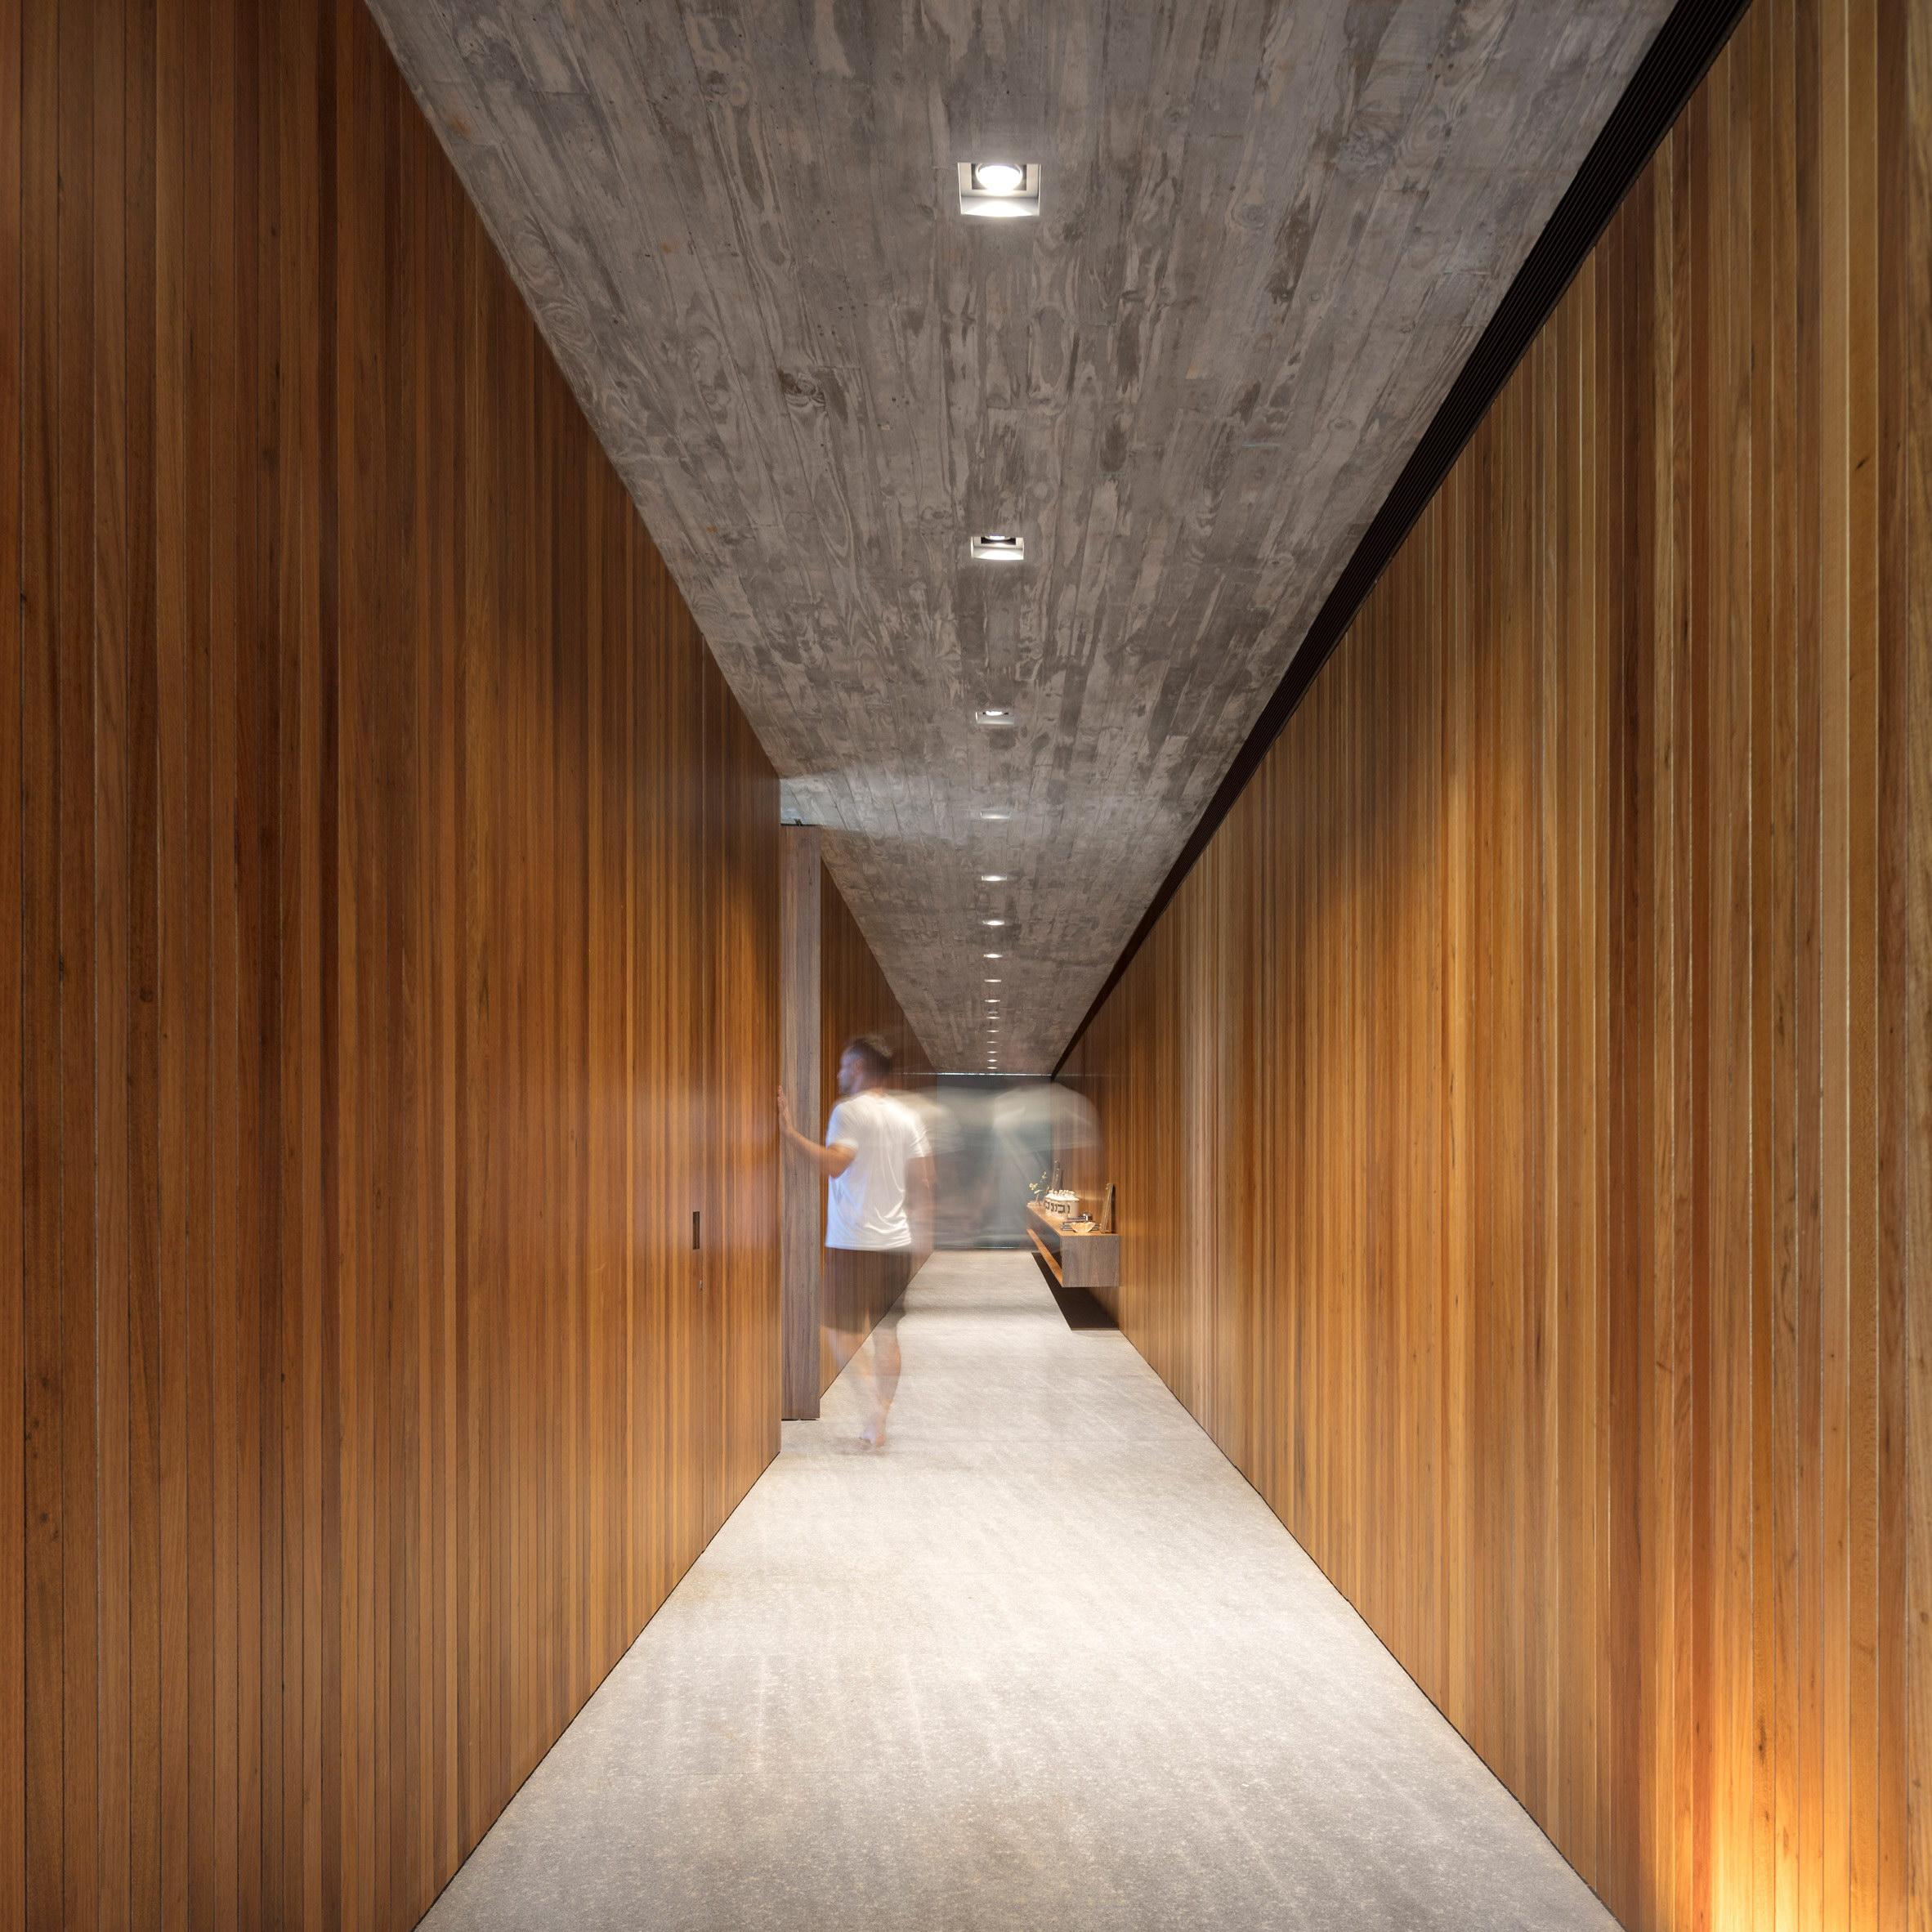 Planar House by Studio MK27 - Marcio Kogan